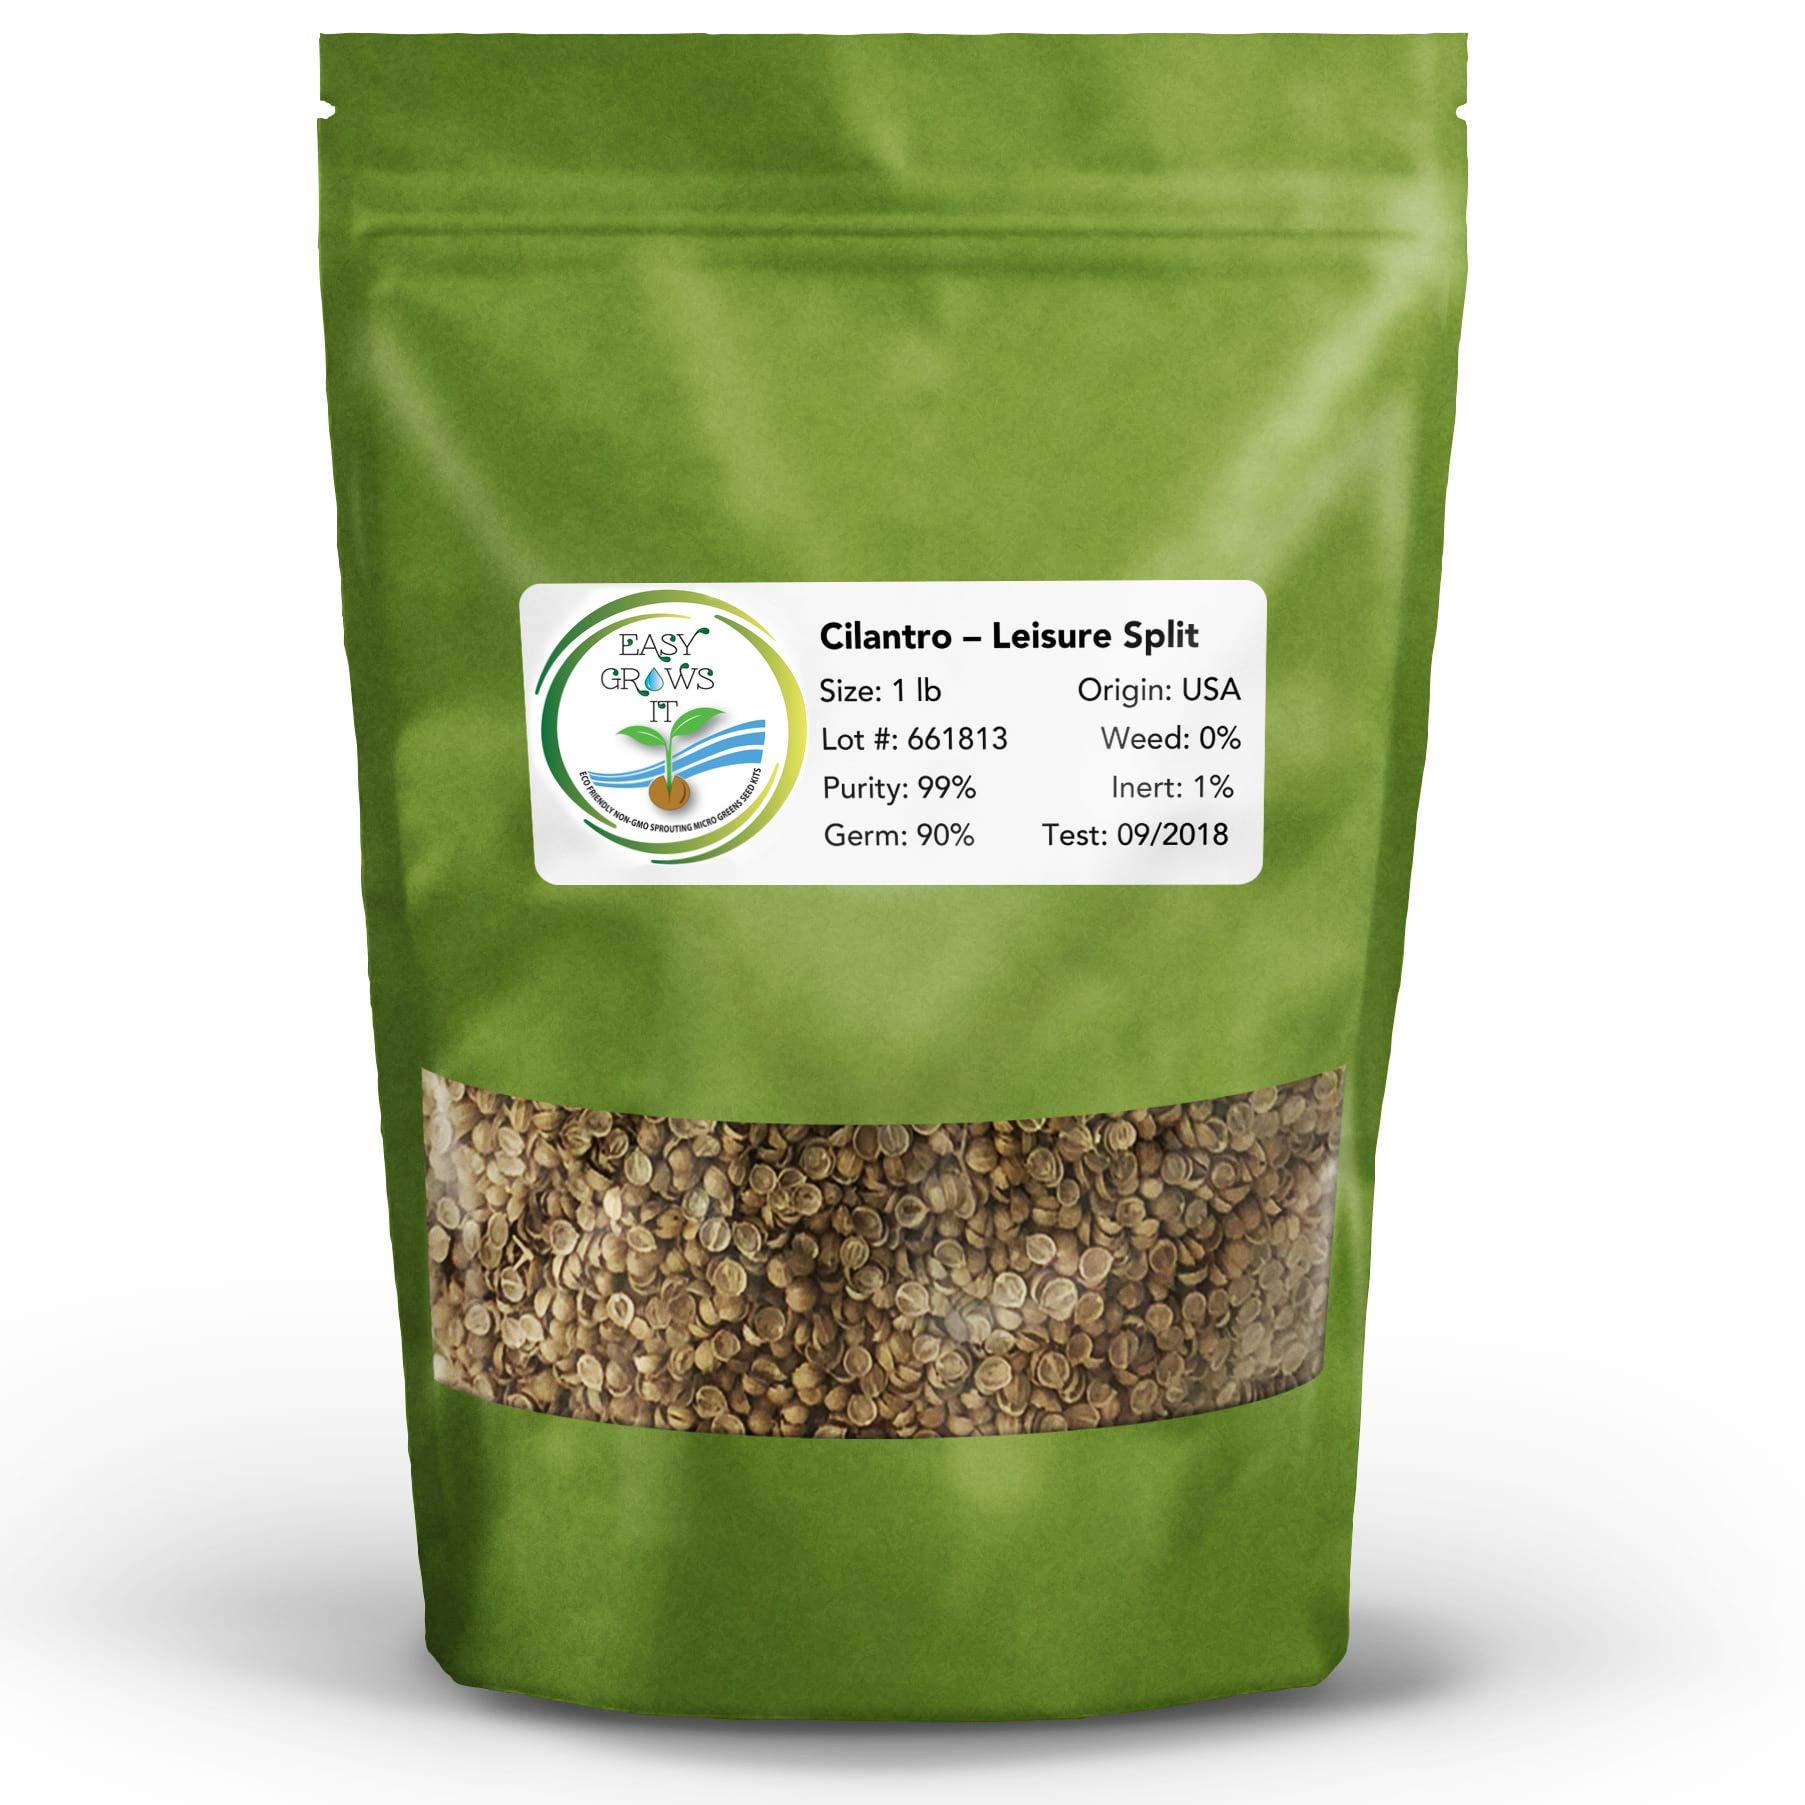 Cilantro Microgreen Seed 1 lb Bulk | Easy Grows It Non GMO Leisure Split Coriander Seeds for Micro Greens, Sprouts, and Gardens